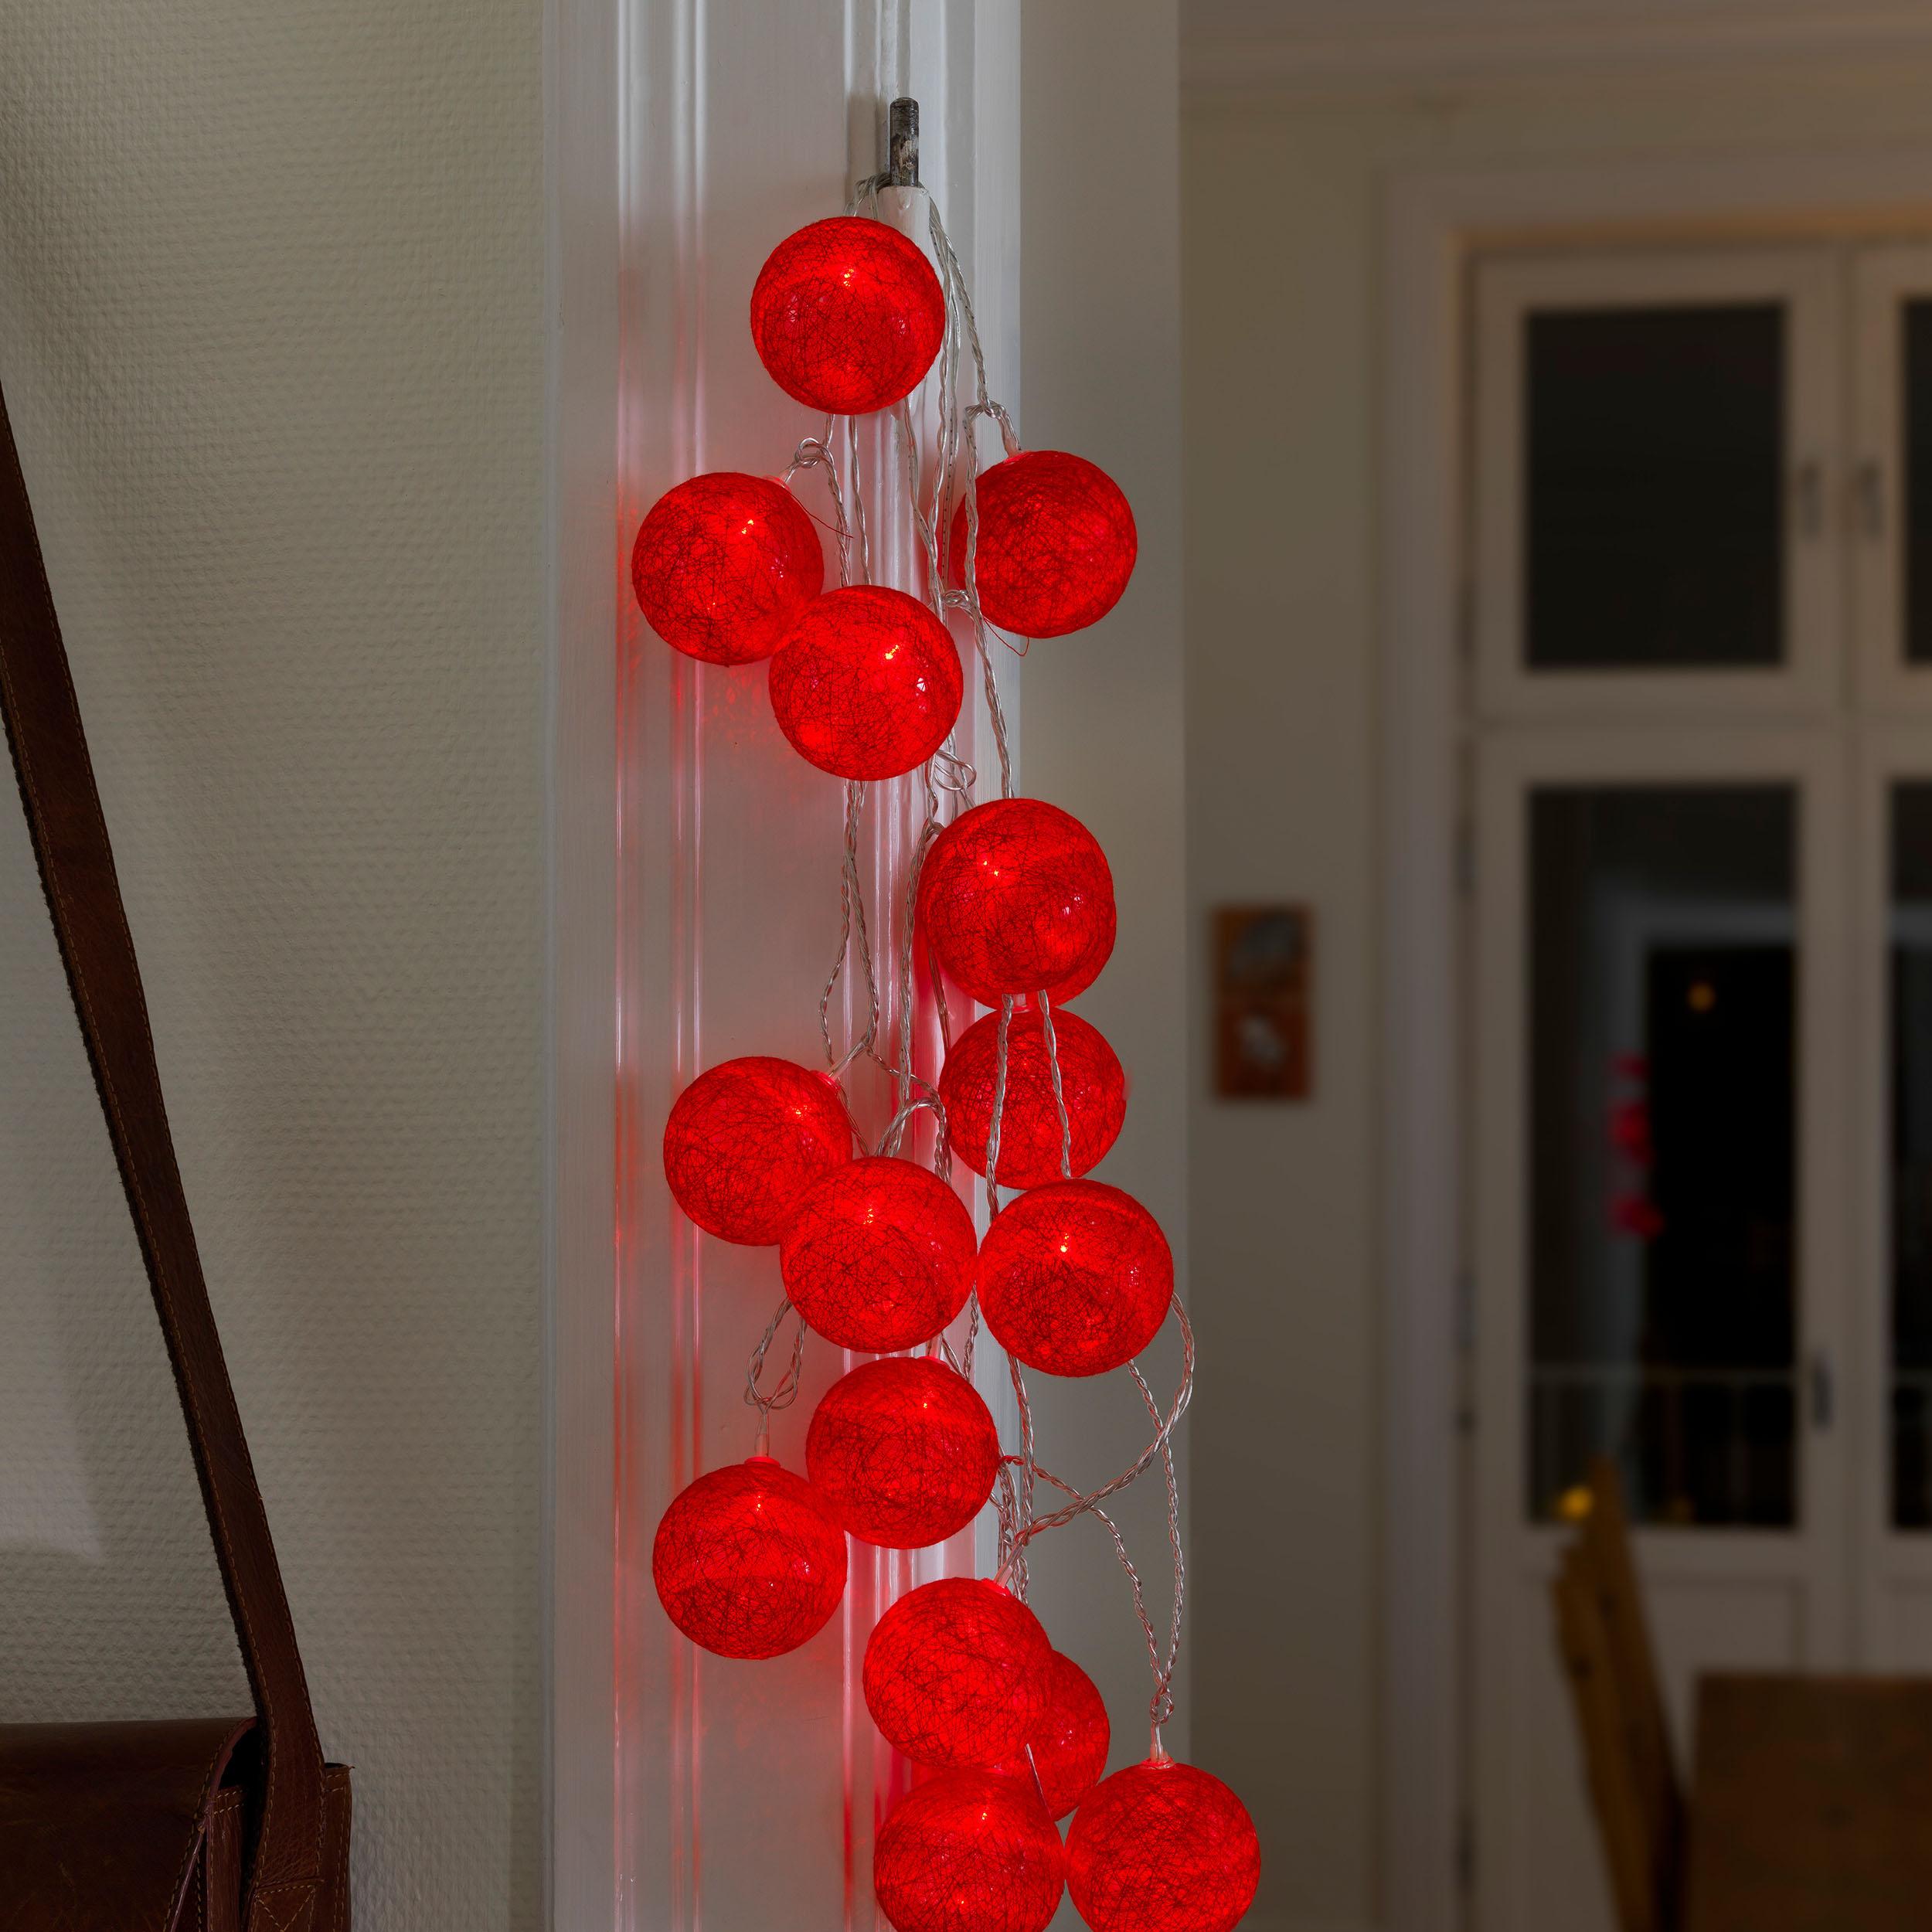 Konstsmide LED-Dekolichterkette, rote Baumwollkugeln, 6 cm 3136-553